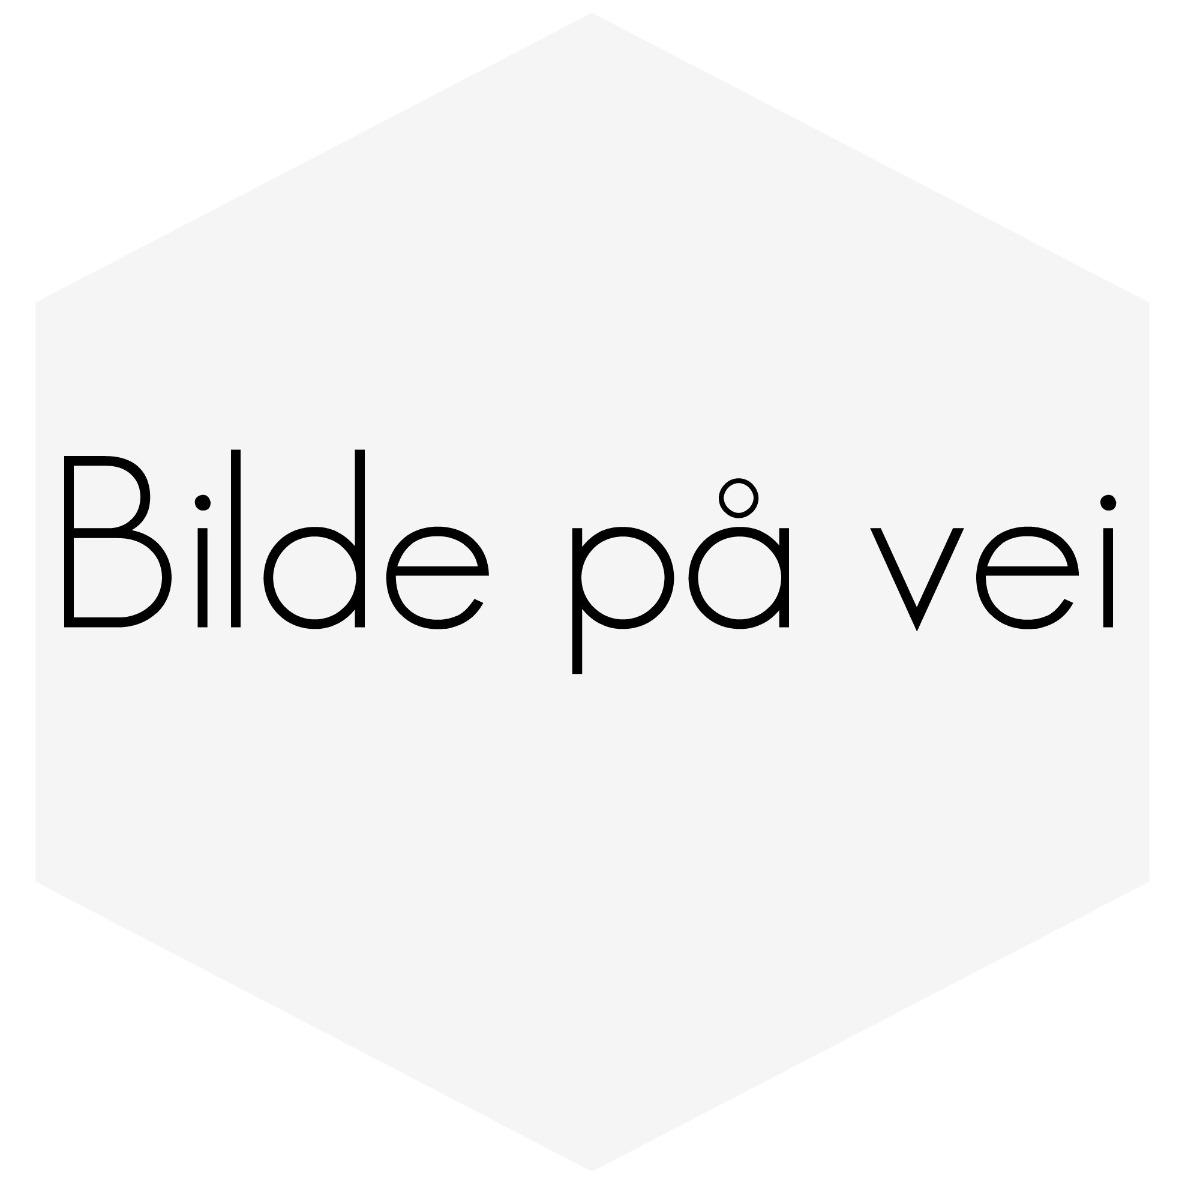 SKVETTLAPP SATS BAK  TIL VOLVO V70 05-07